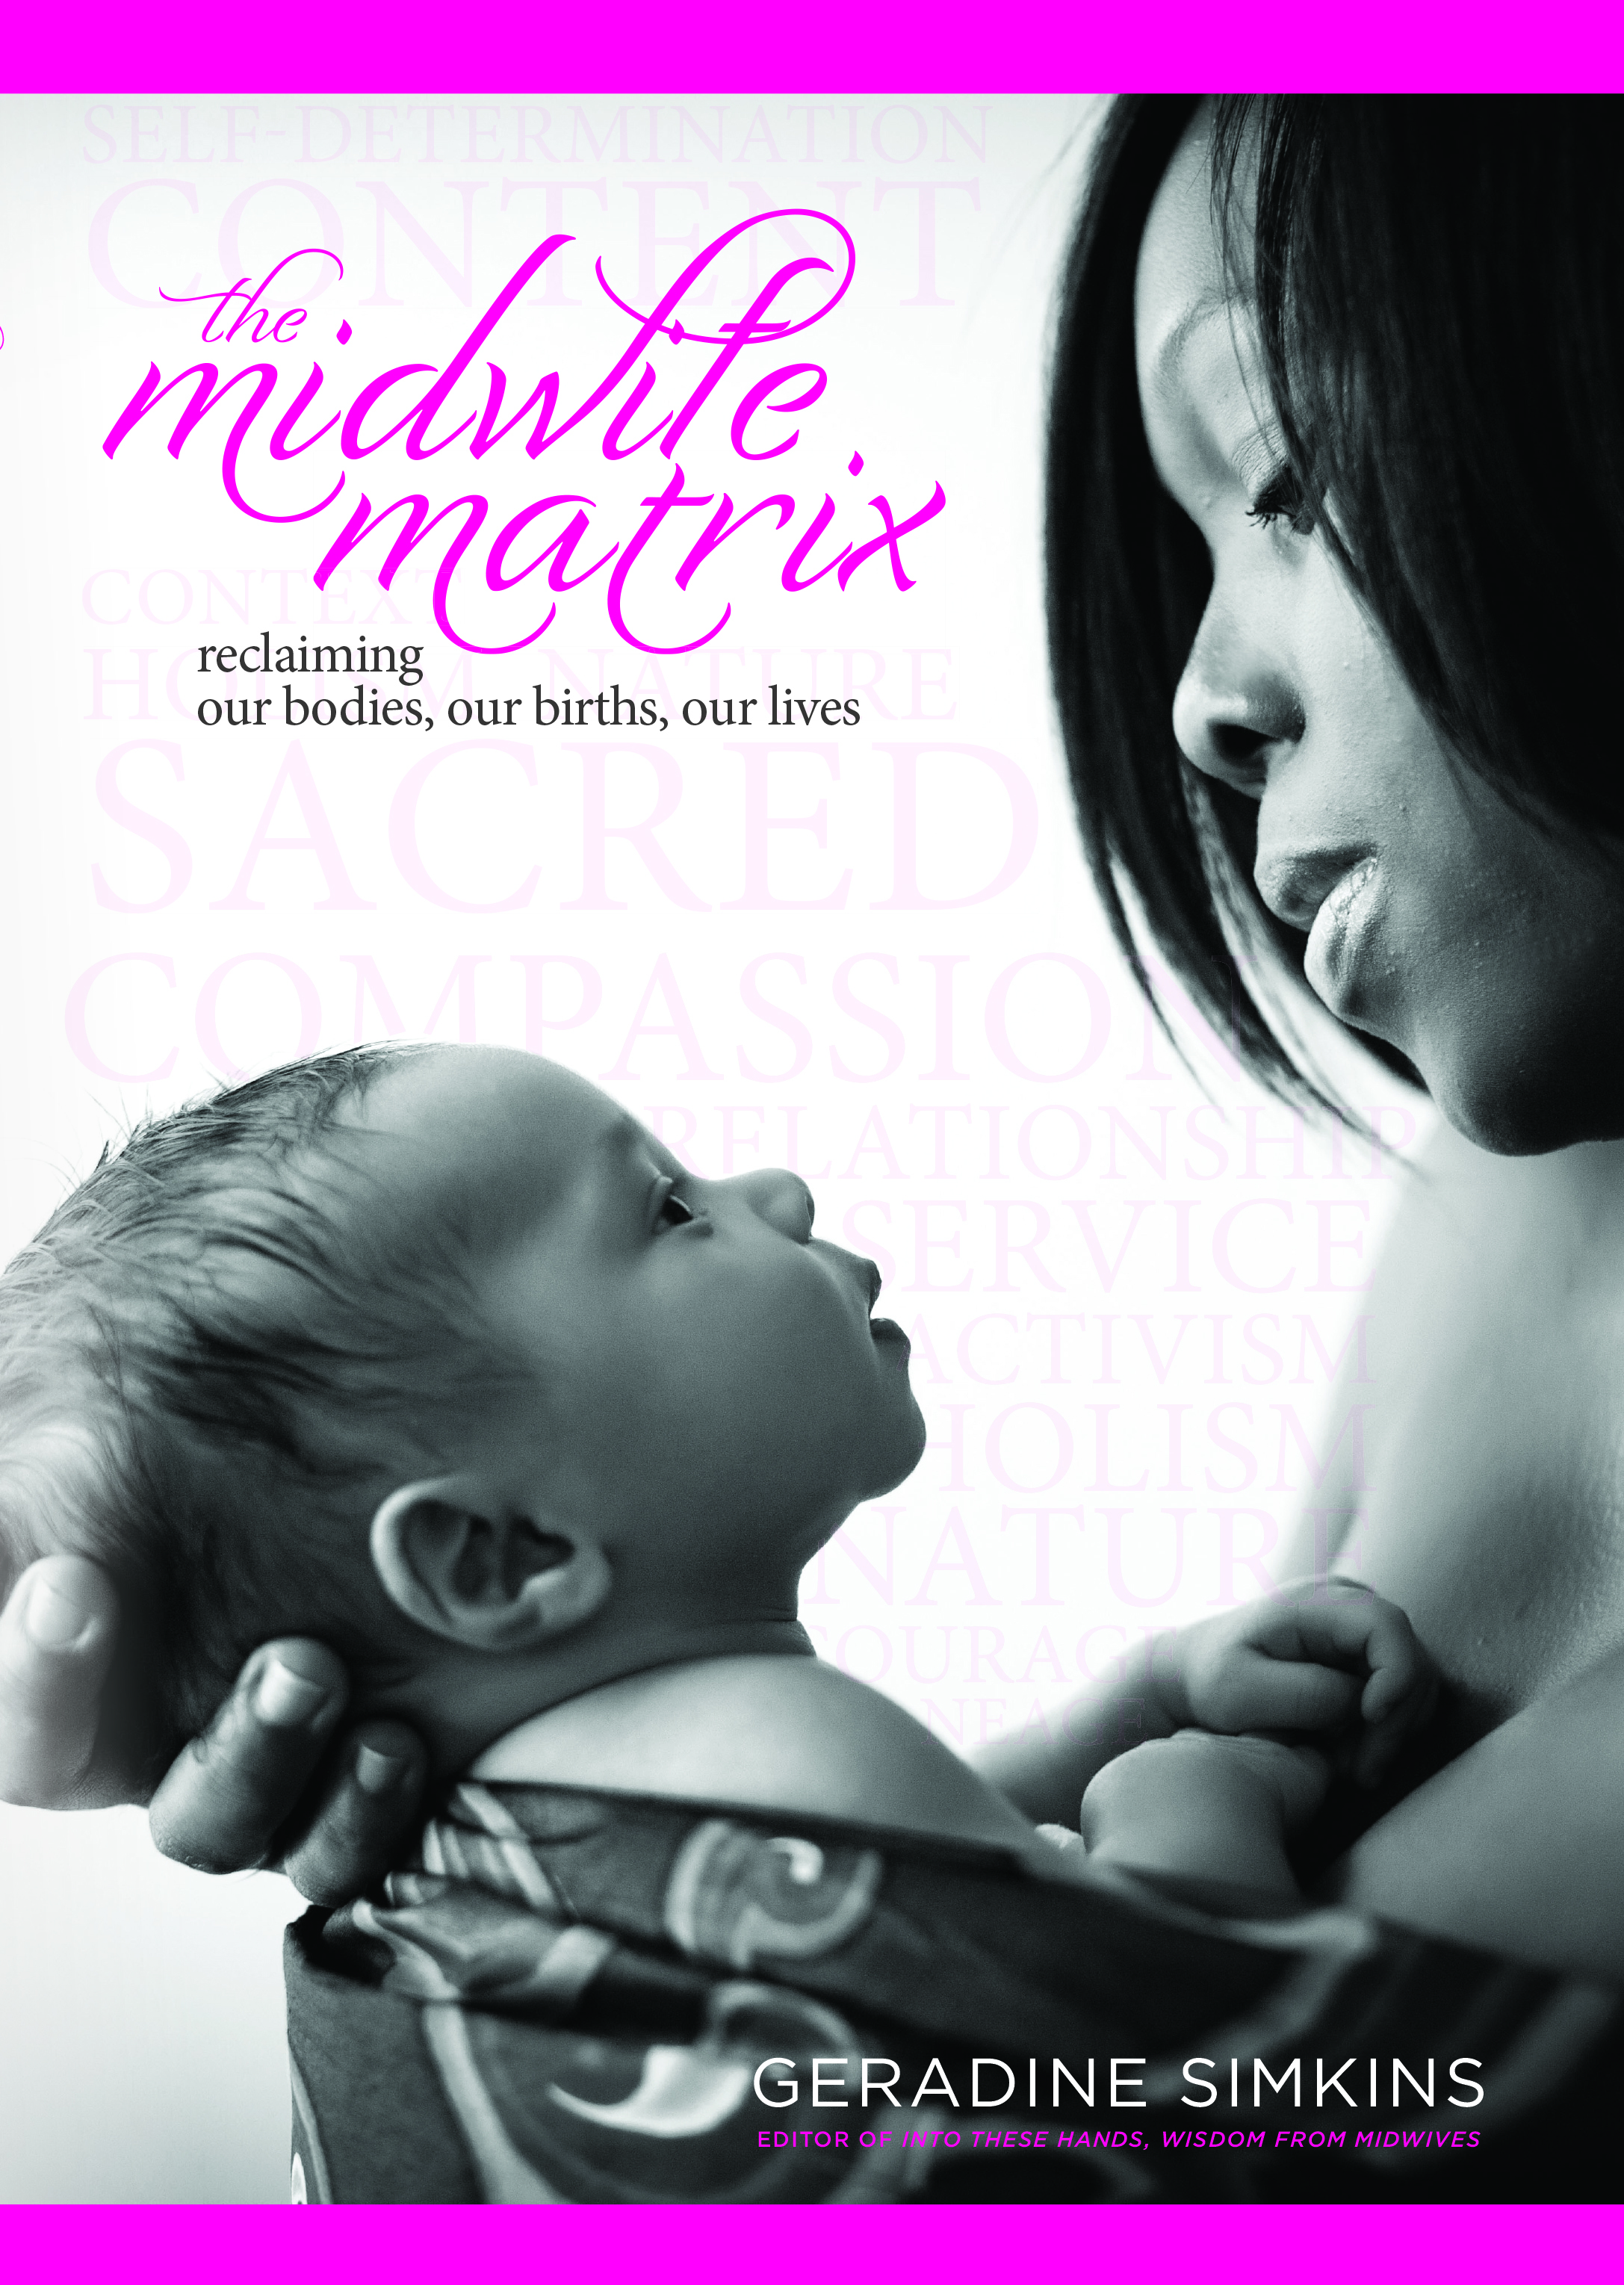 the midwife matrix